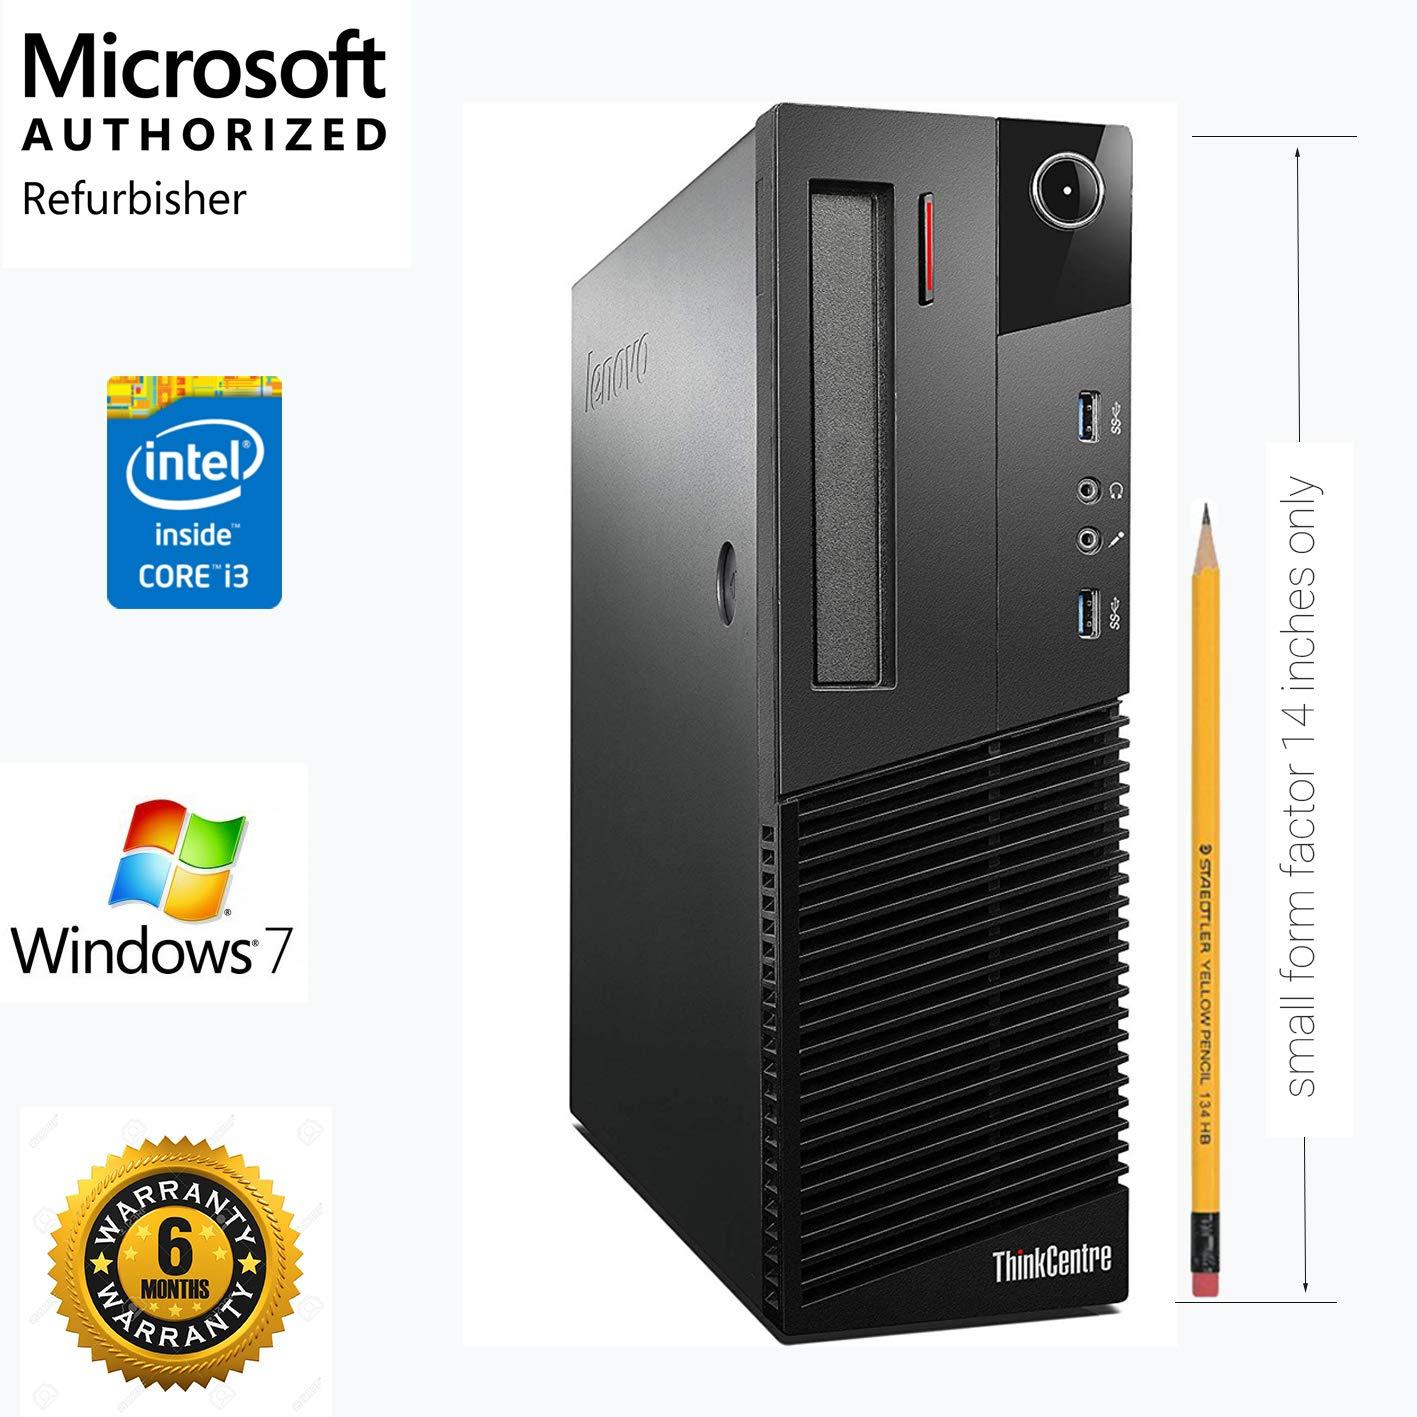 (Renewed) Lenovo Thinkcenter M80 (Core_I3 3.2 Ghz, 4GB DDR3,